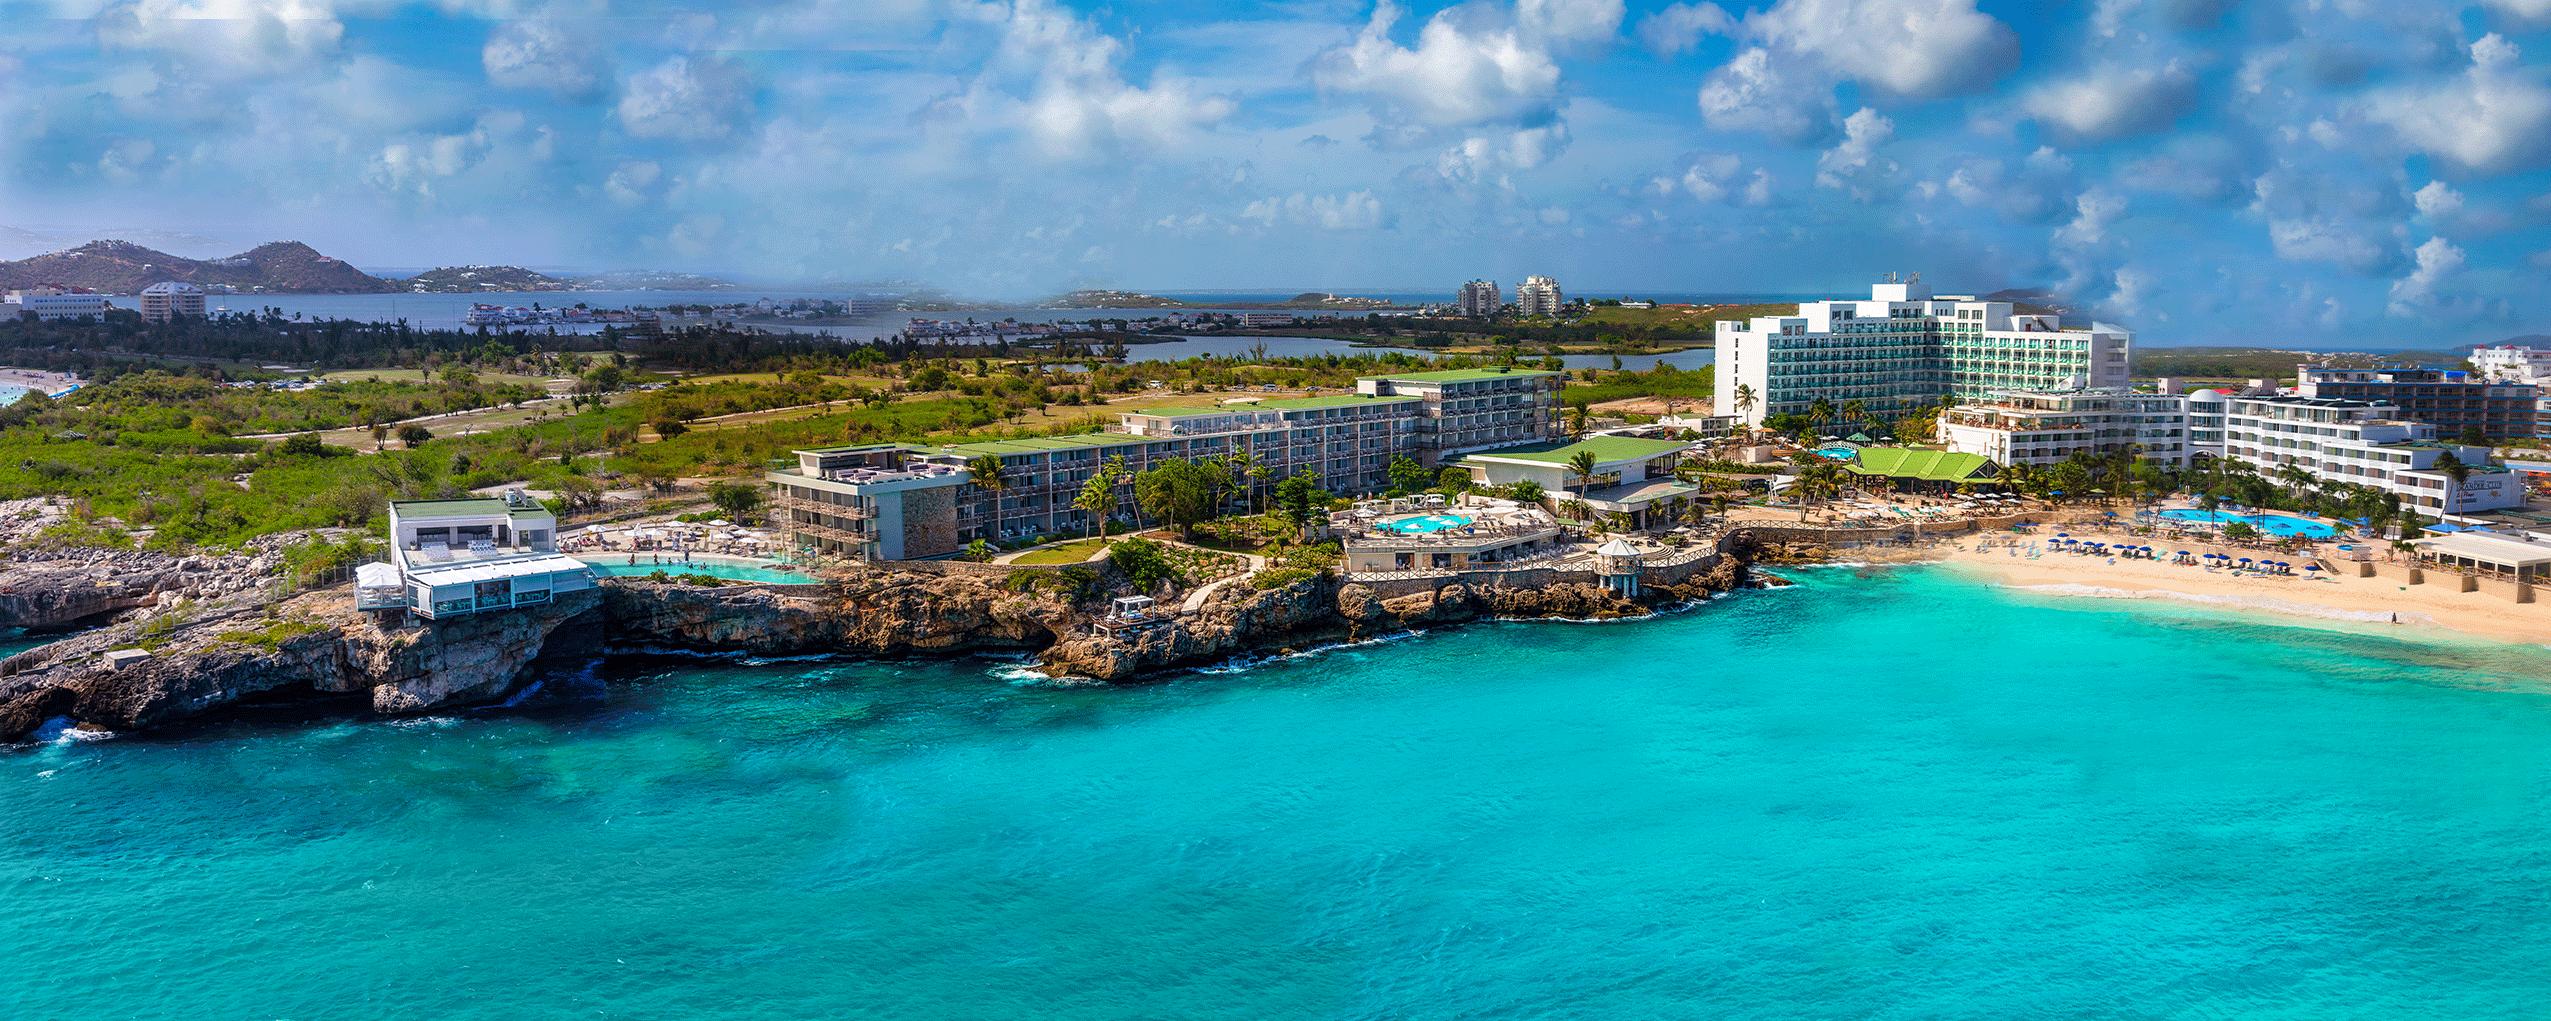 Sonesta St Maarten Resorts Panorama